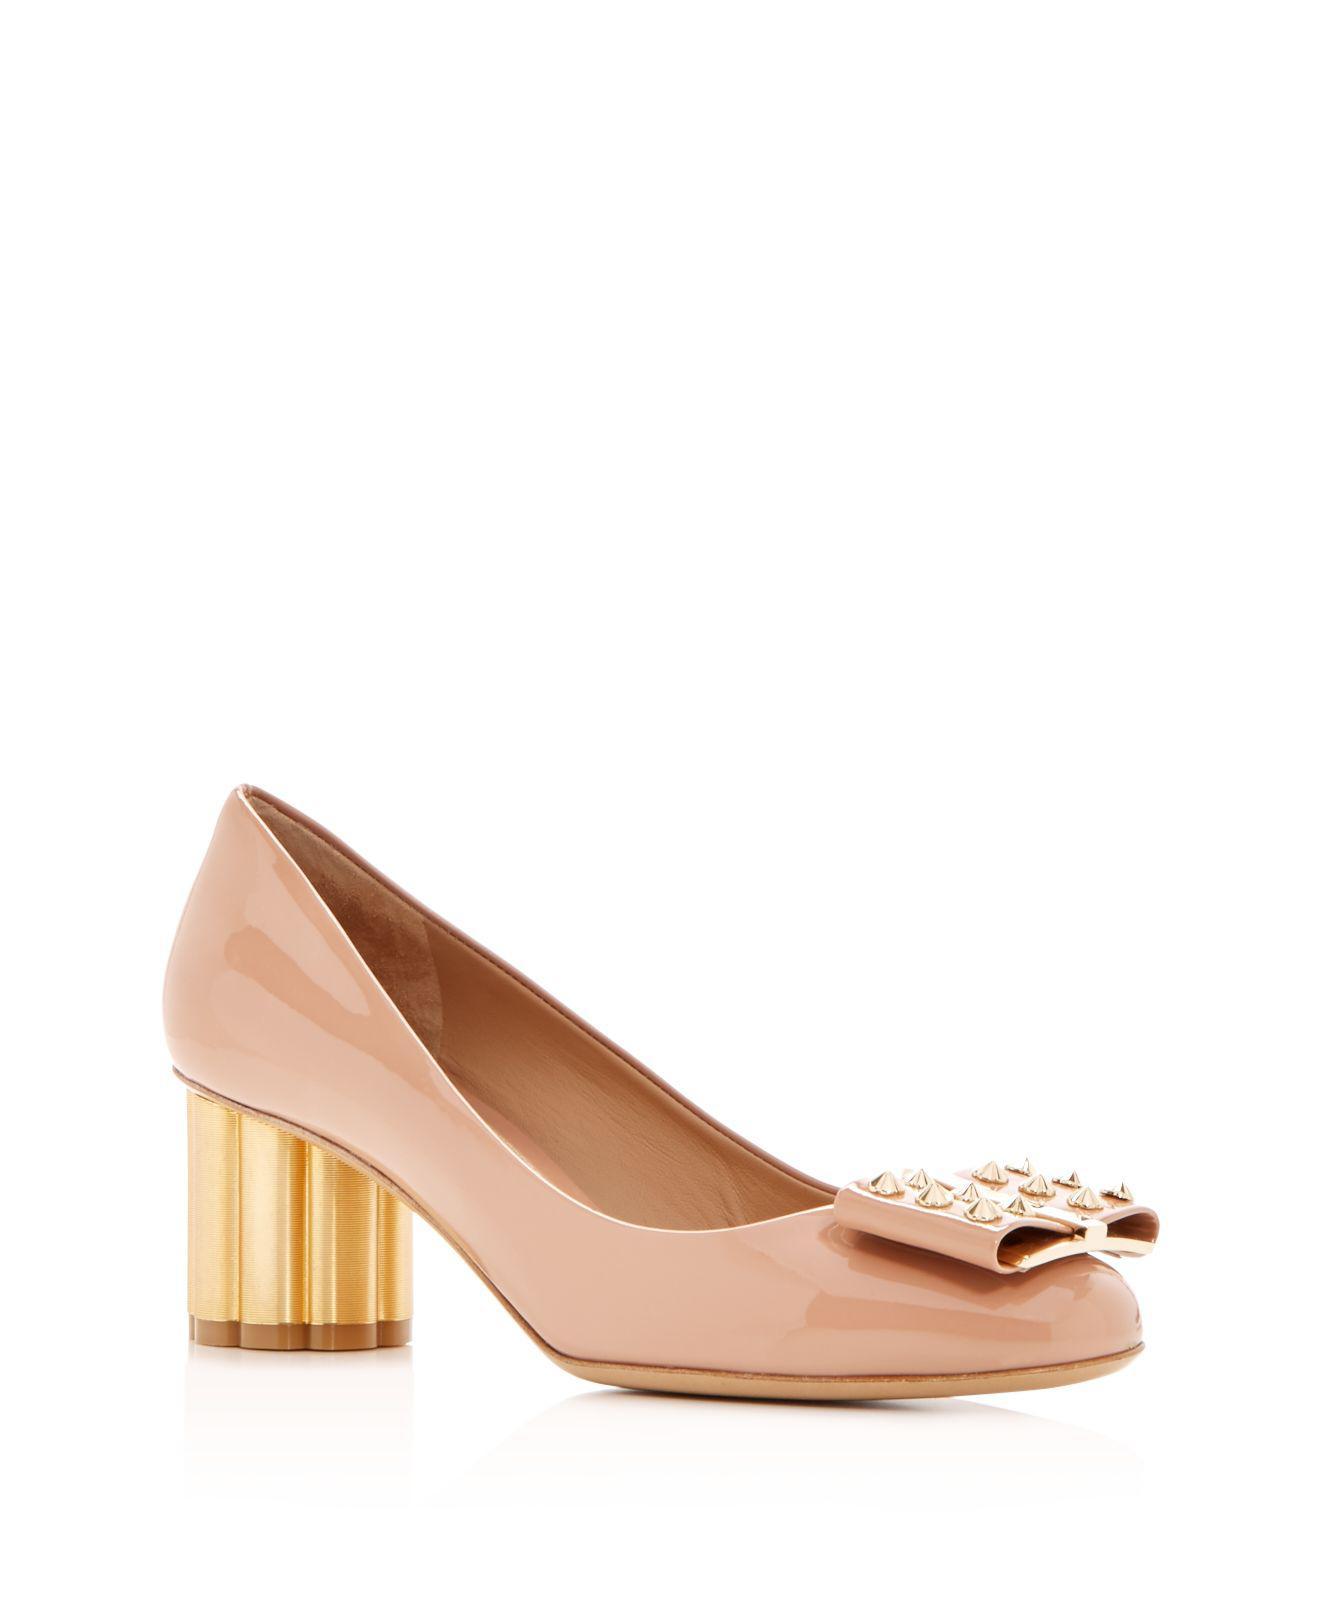 Salvatore Ferragamo Women's Capua 55 Patent Leather Floral Heel Pumps Y9oBb